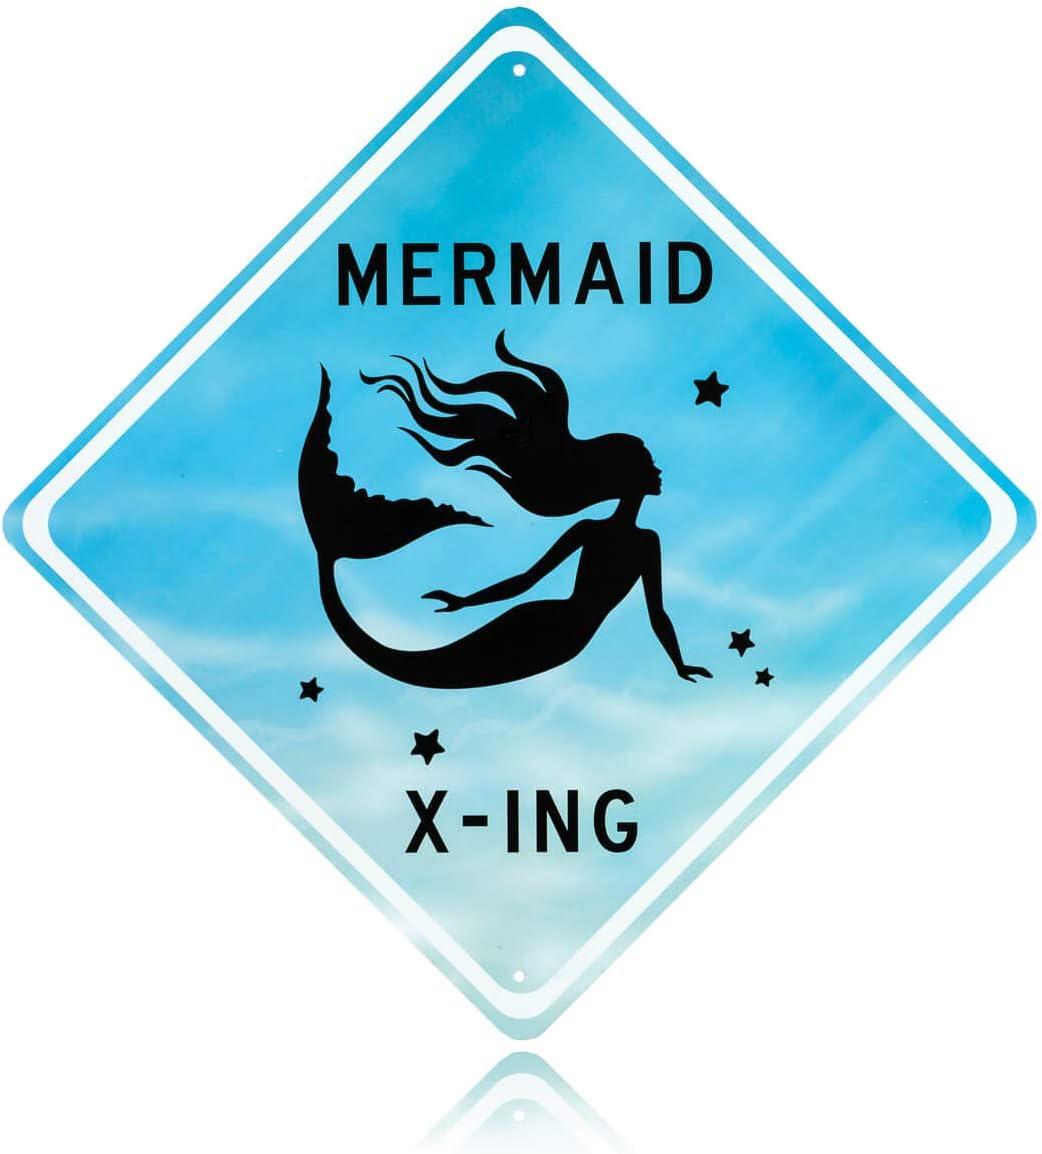 Mermaid room decor - Decorative Aluminum Blue Mermaid Crossing Street Sign. Beautiful Bedroom art for little girls room. Put the poster away & splash her room with tin wall art mermaids x-ing signs!